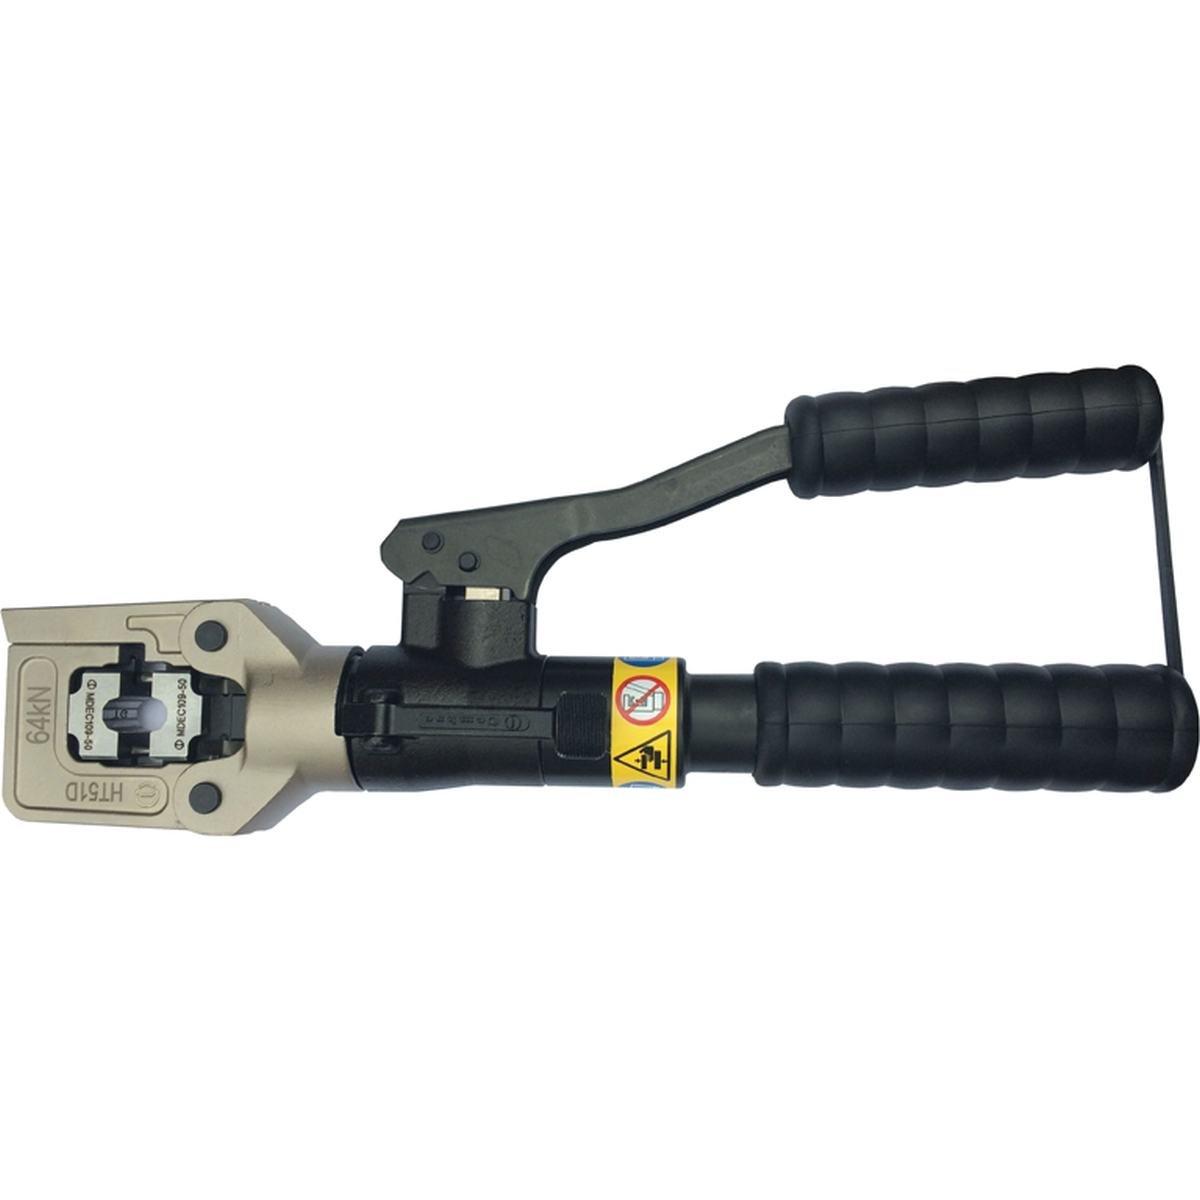 Krympetang HT51D-TG FastPipe